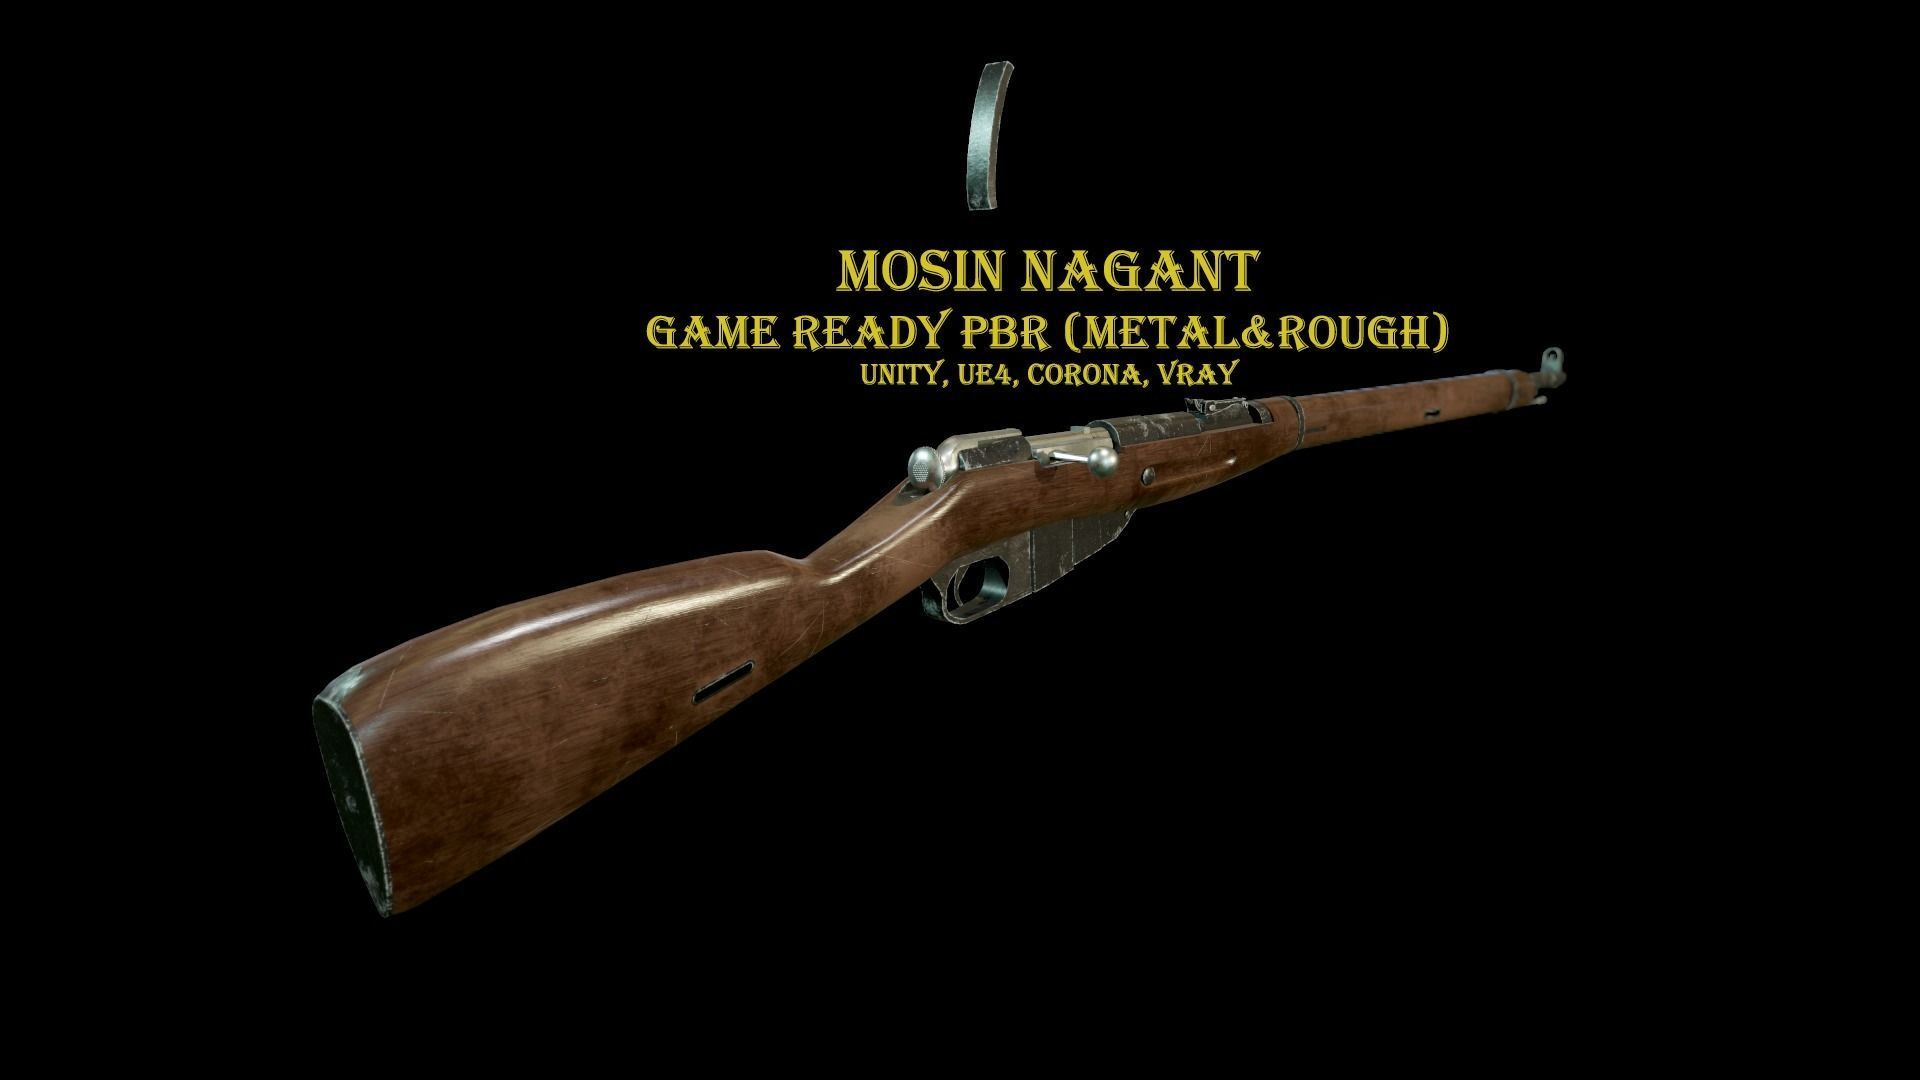 Mosin Nagant Rifle scratched